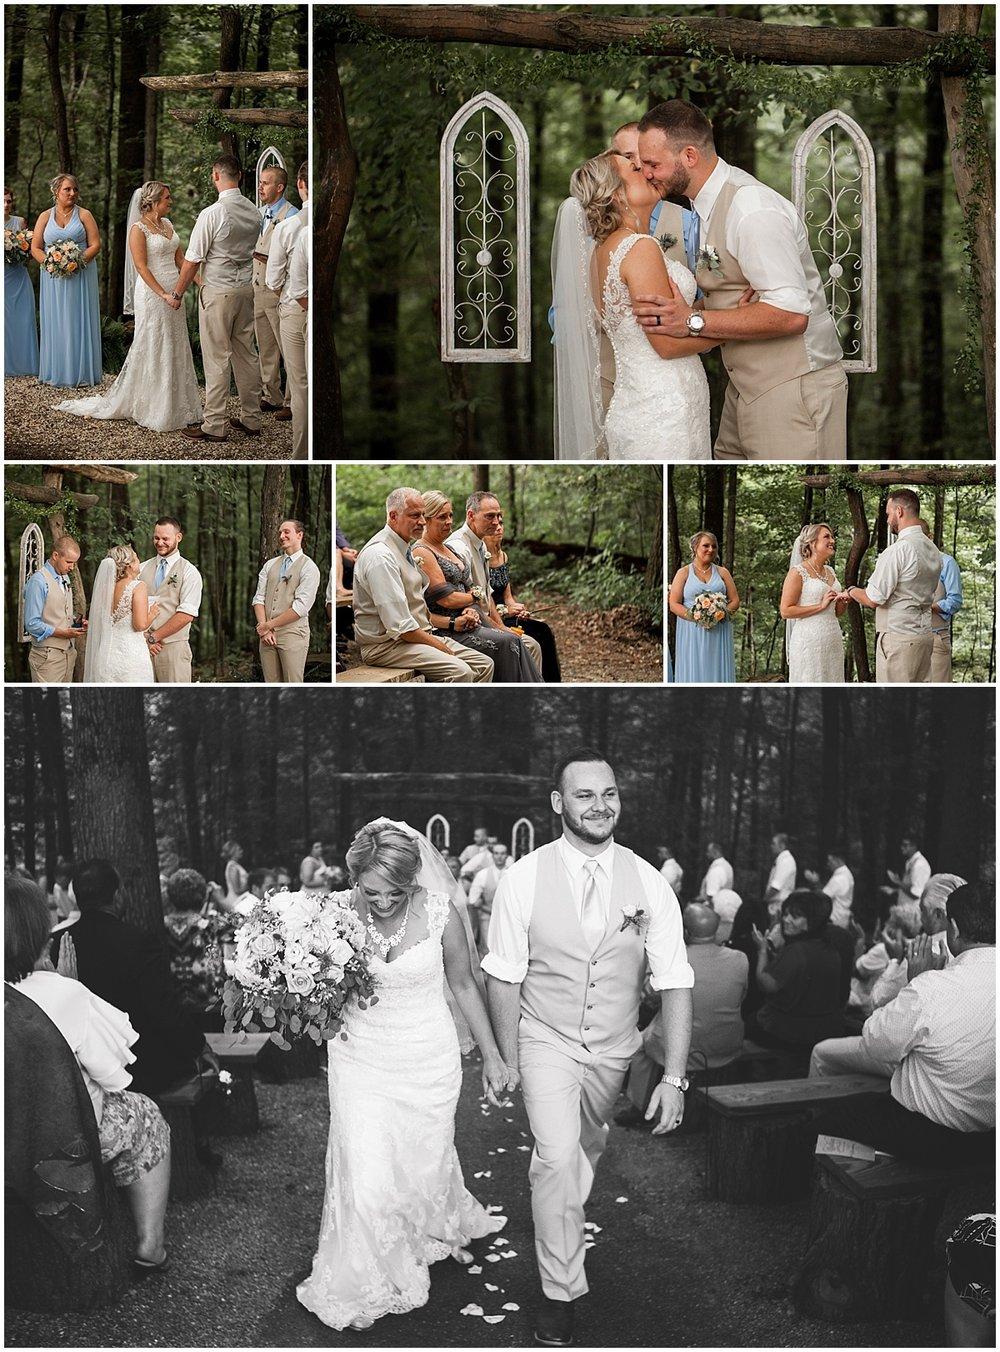 pittsburgh wedding photographer bride and groom